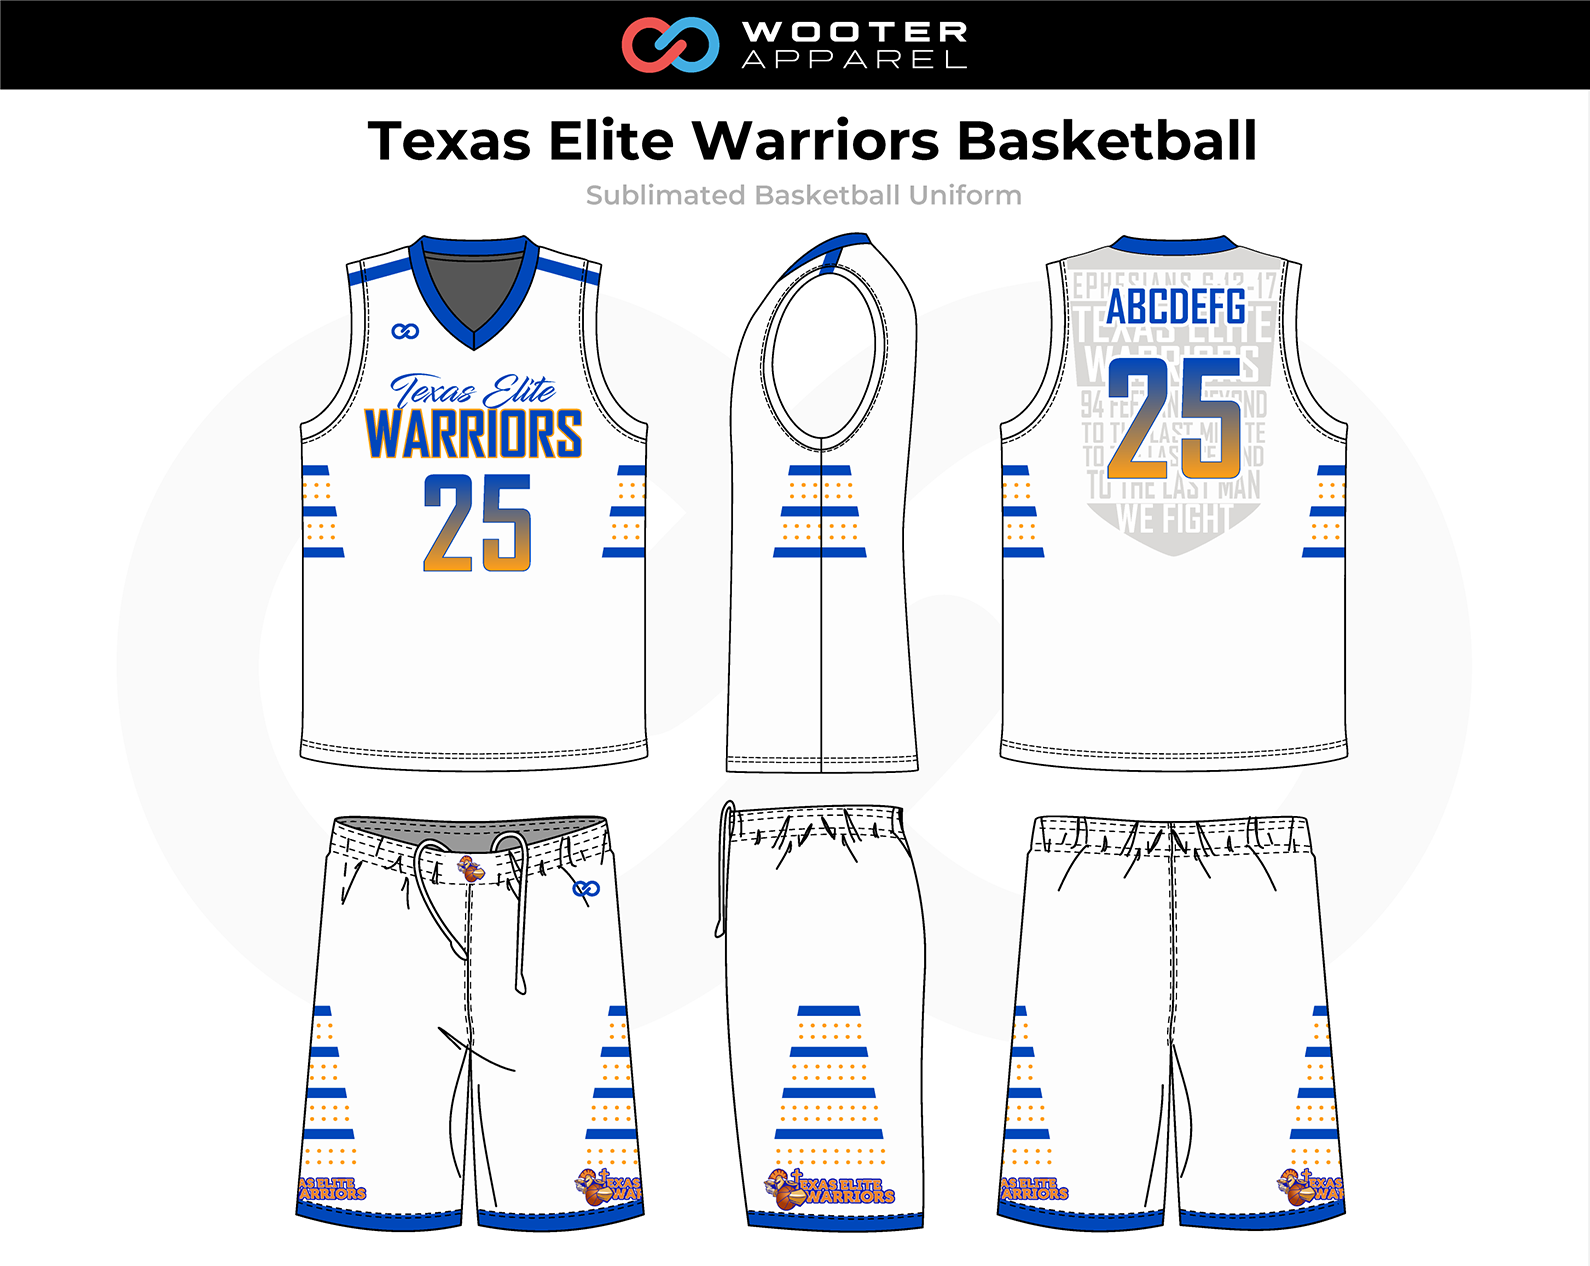 2018-11-08 Texas Elite Warriors Basketball Uniform (White).png